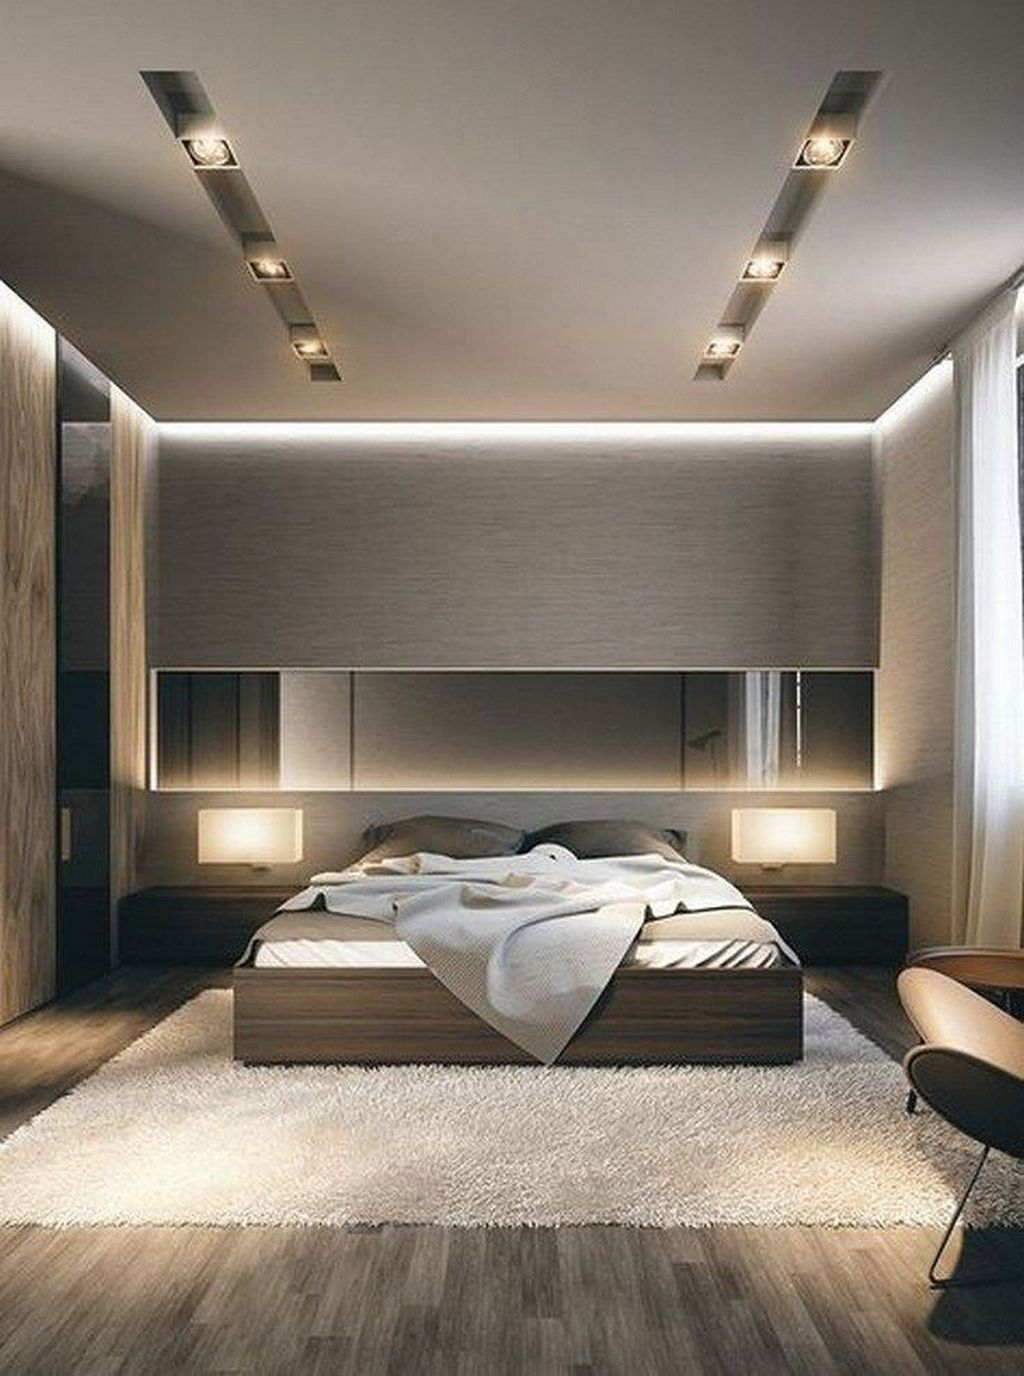 37 Unique And Simple Ceiling Design In 2020 Luxury Bedroom Design Amazing Bedroom Designs Modern Master Bedroom